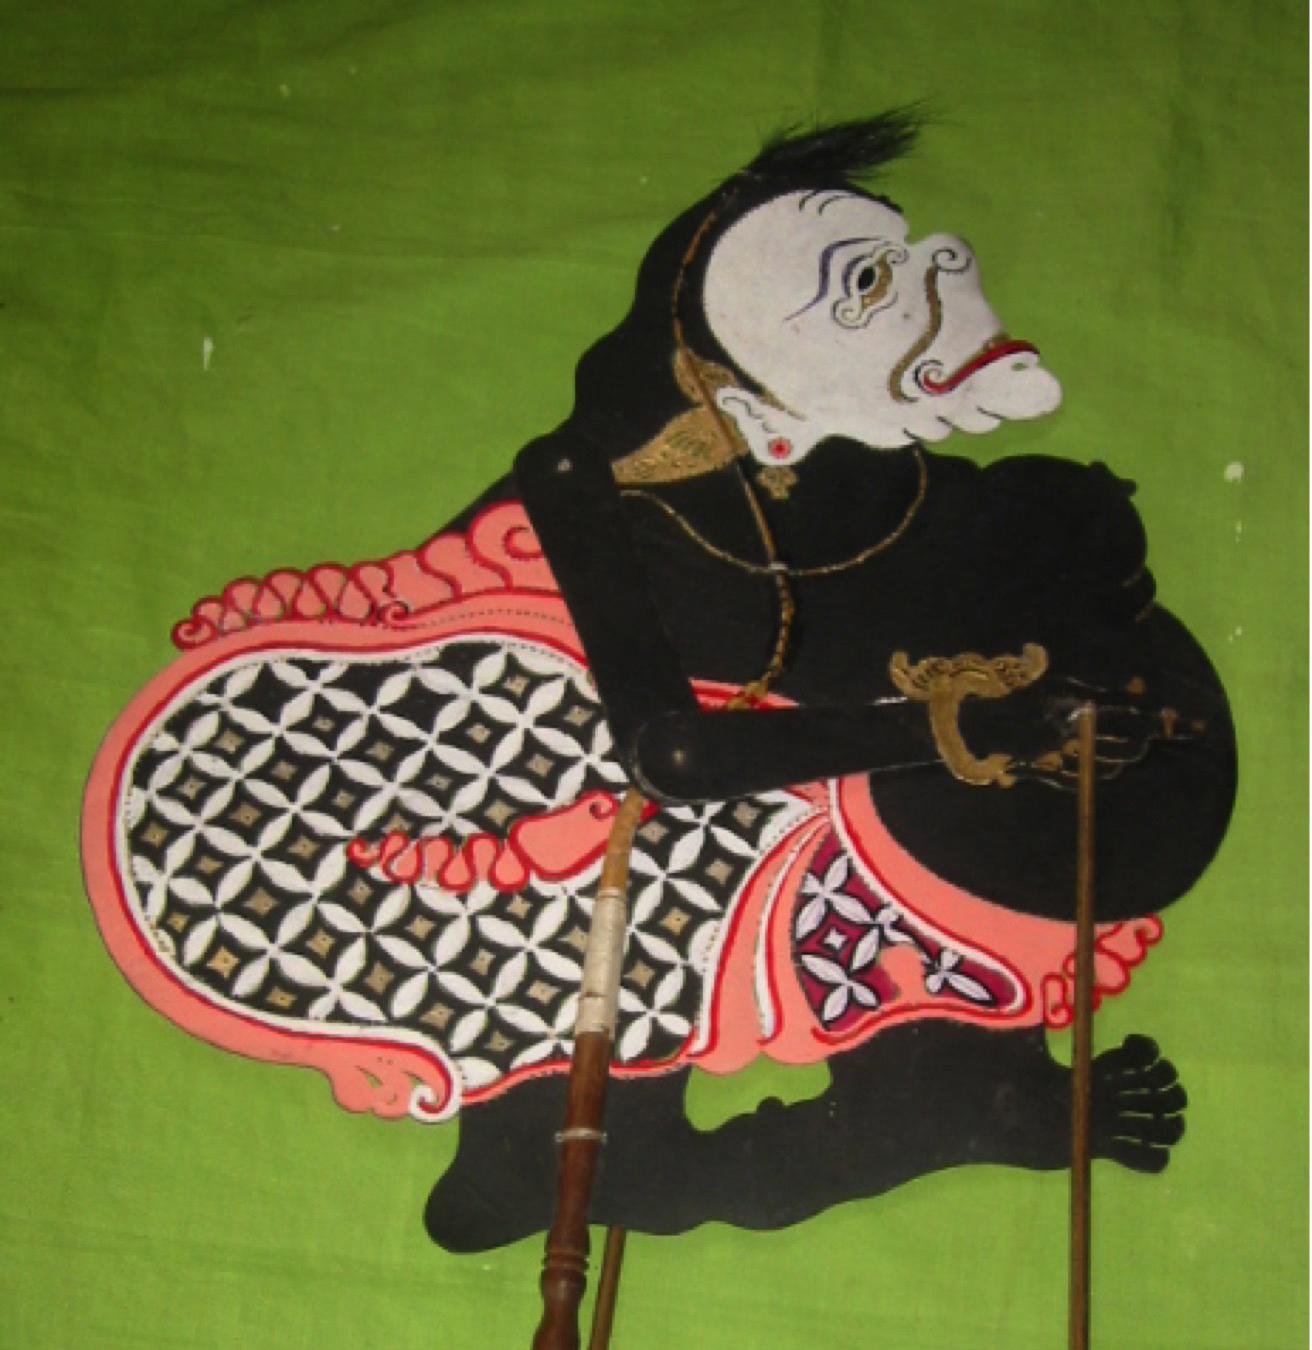 Semar, une figurine d'ombre de Banjar, <em>wayang</em> kulit Banjar, Kalimantan Sud, Indonésie. Photo: Karen Smith